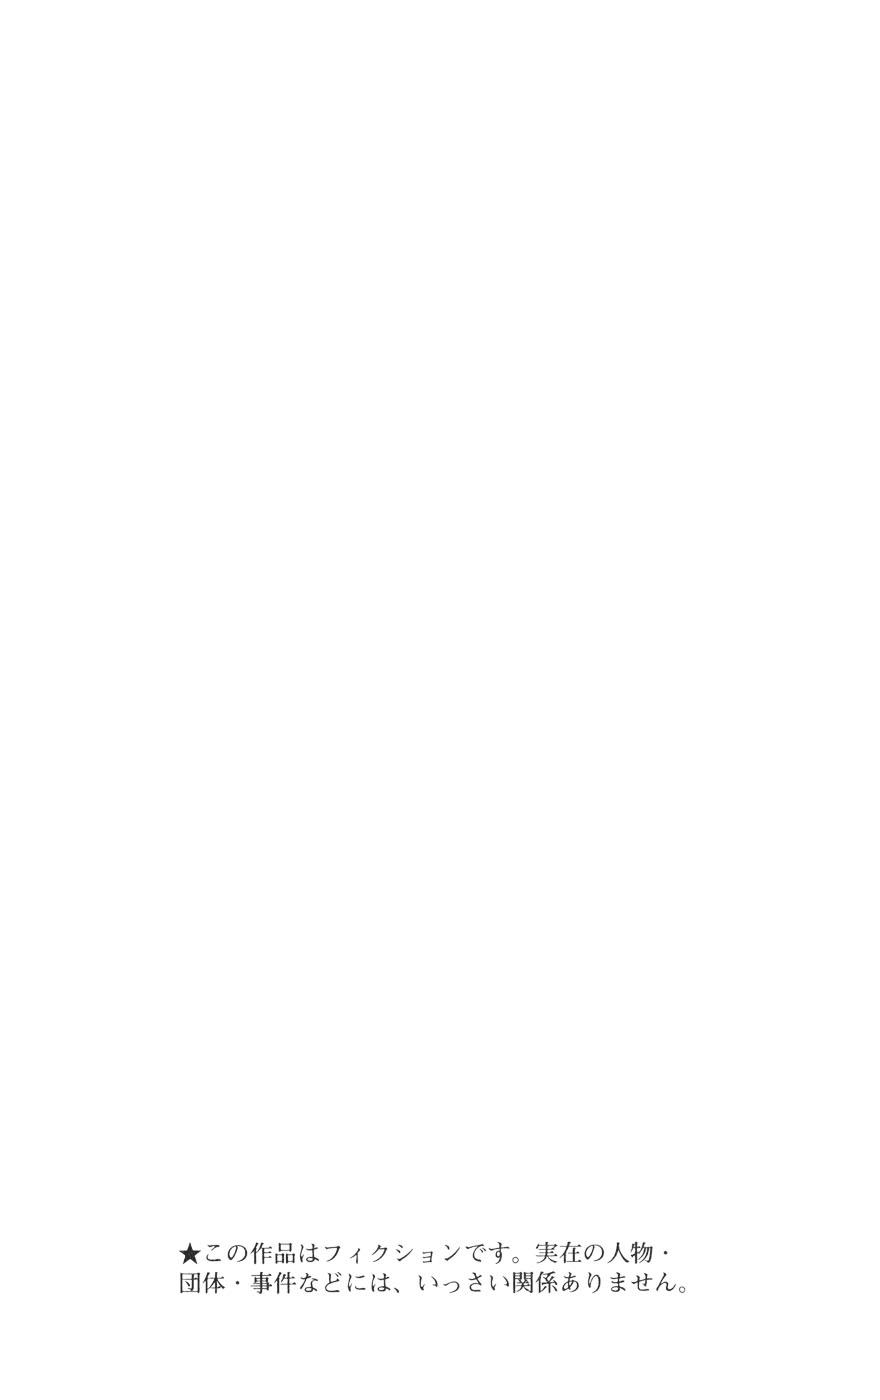 Манга Любовные неприятности / To Love-Ru  - Том 8 Глава 62 Страница 7